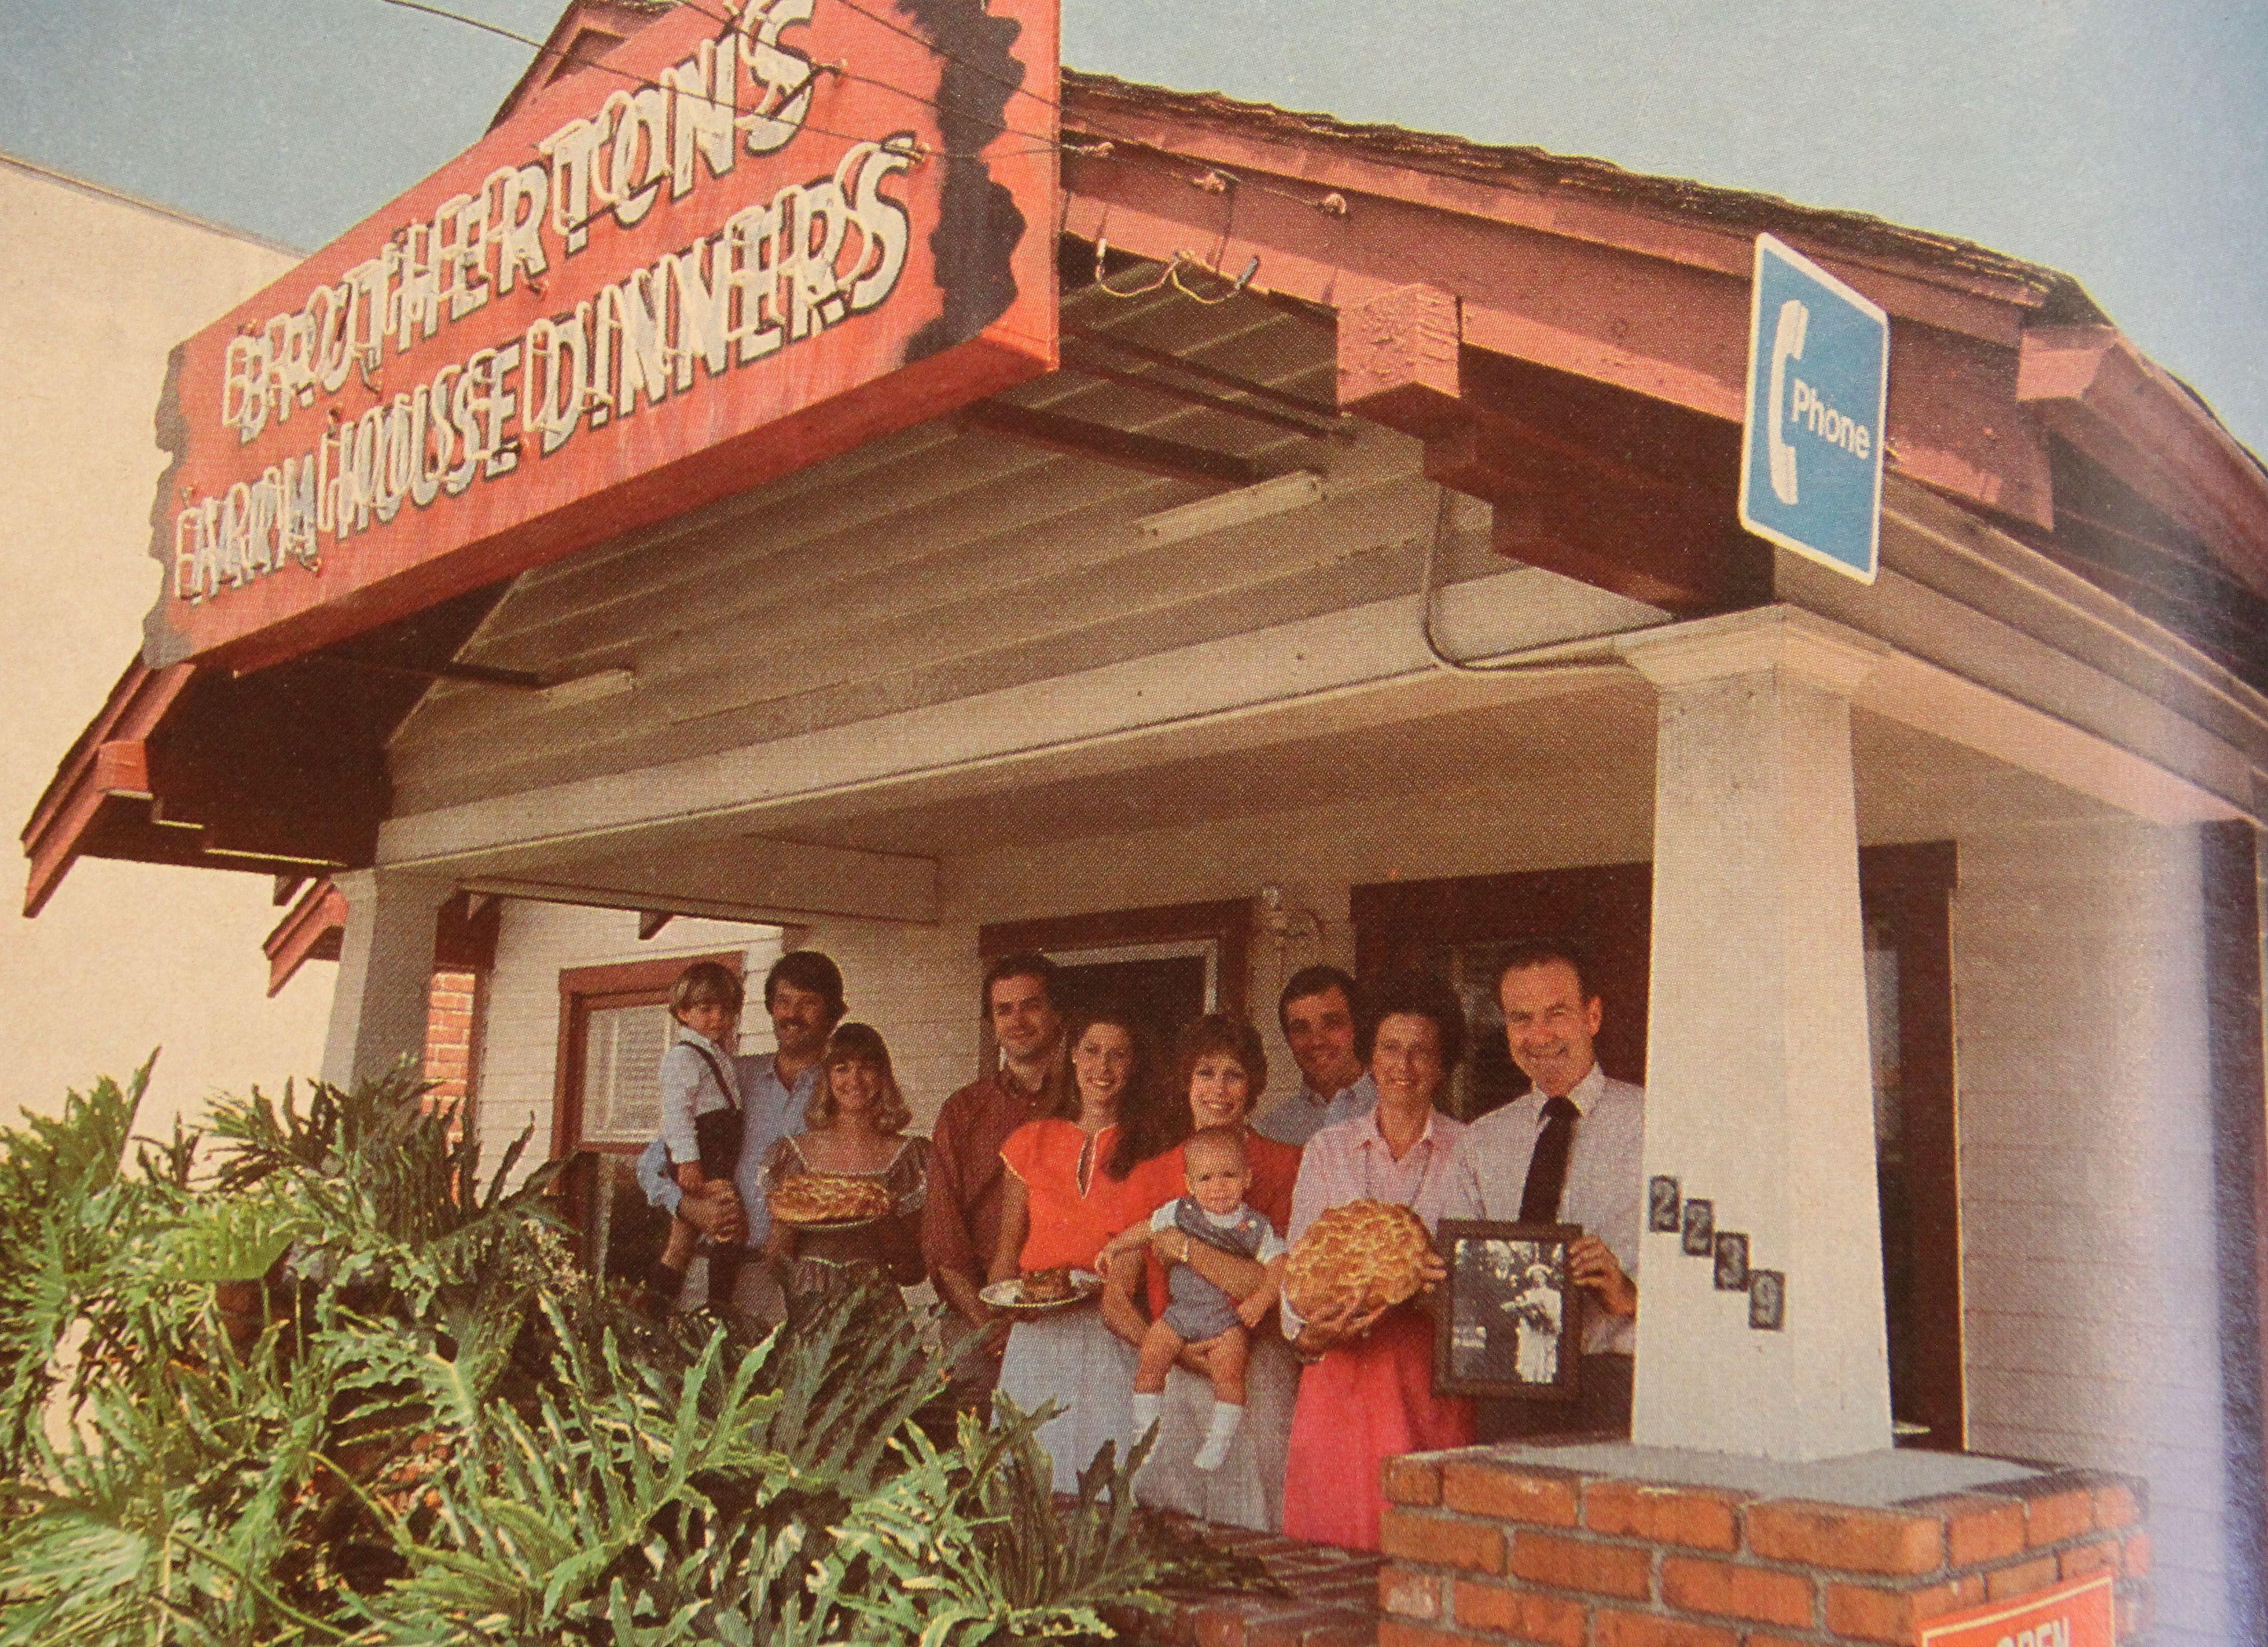 Brotherton\'s Farmhouse in Pasadena - Circa 1980 | Old Los Angeles ...